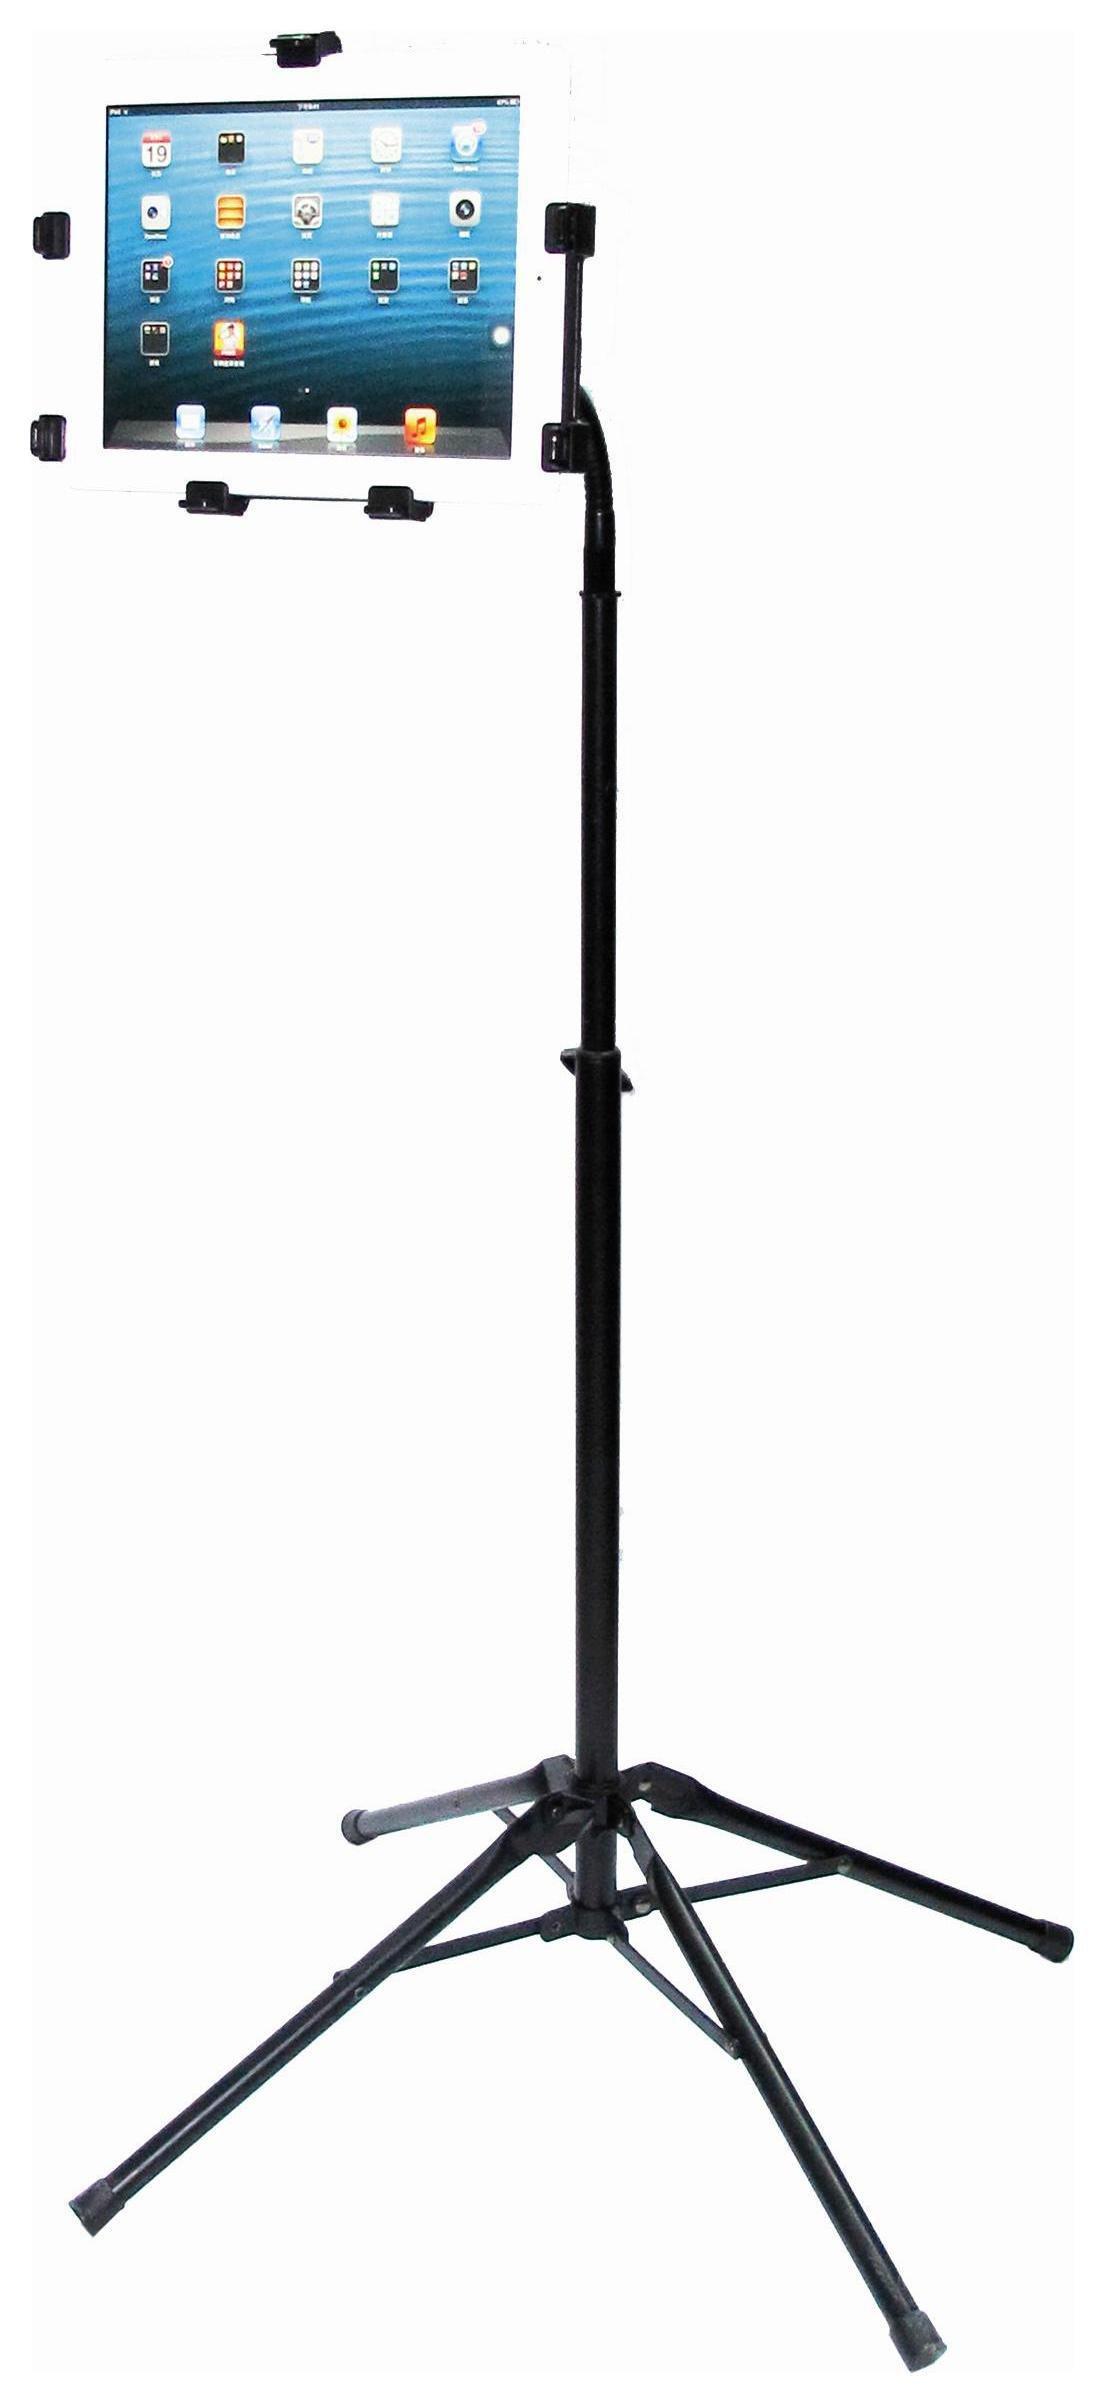 accessories page 642 argos price tracker. Black Bedroom Furniture Sets. Home Design Ideas